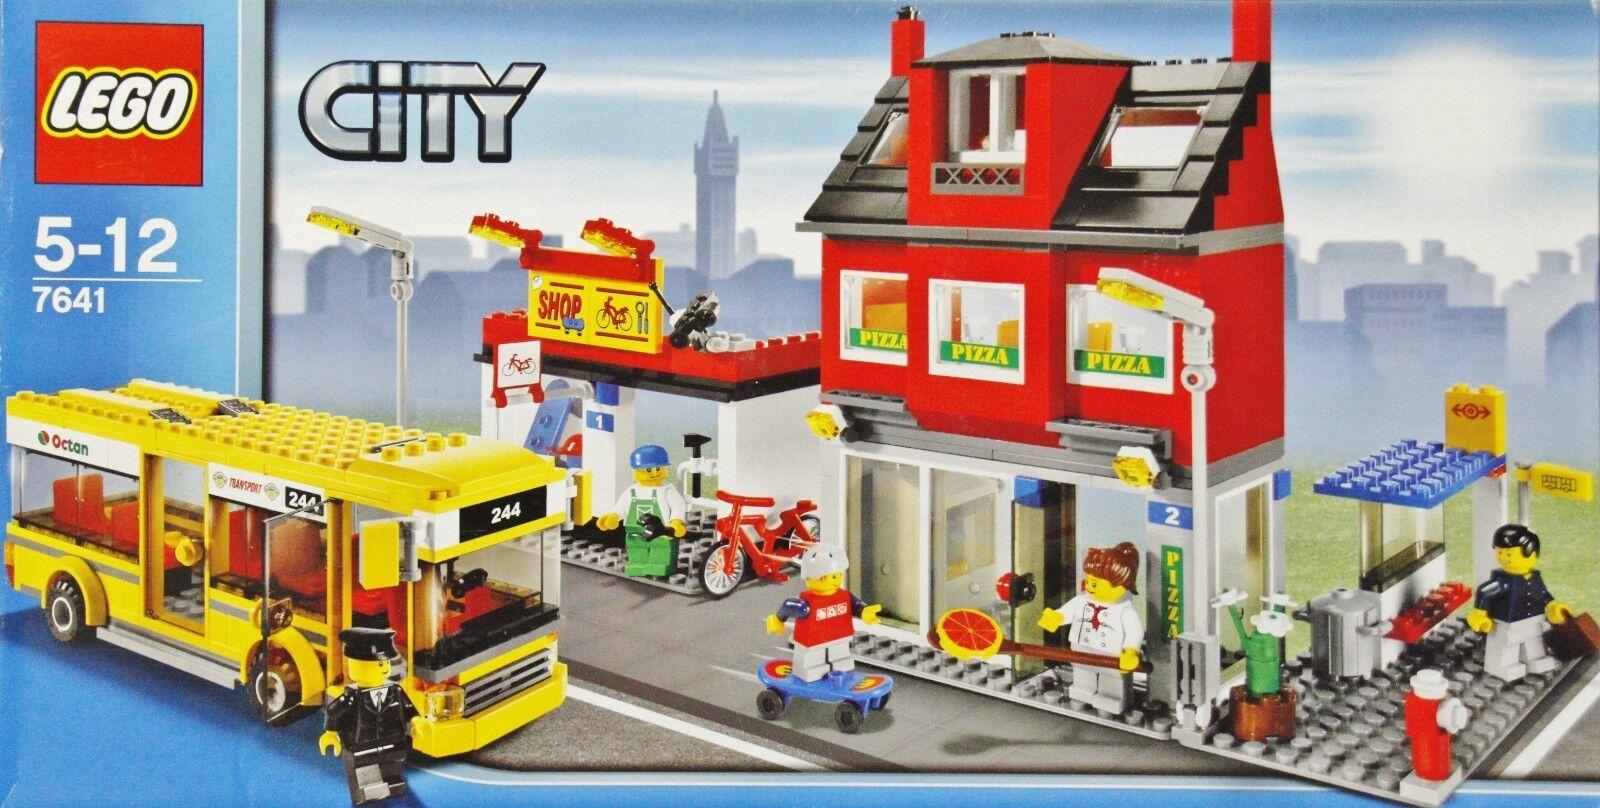 Lego City 7641 Stadtviertel mit Bus NEU Fahrrad Shop Pizzeria